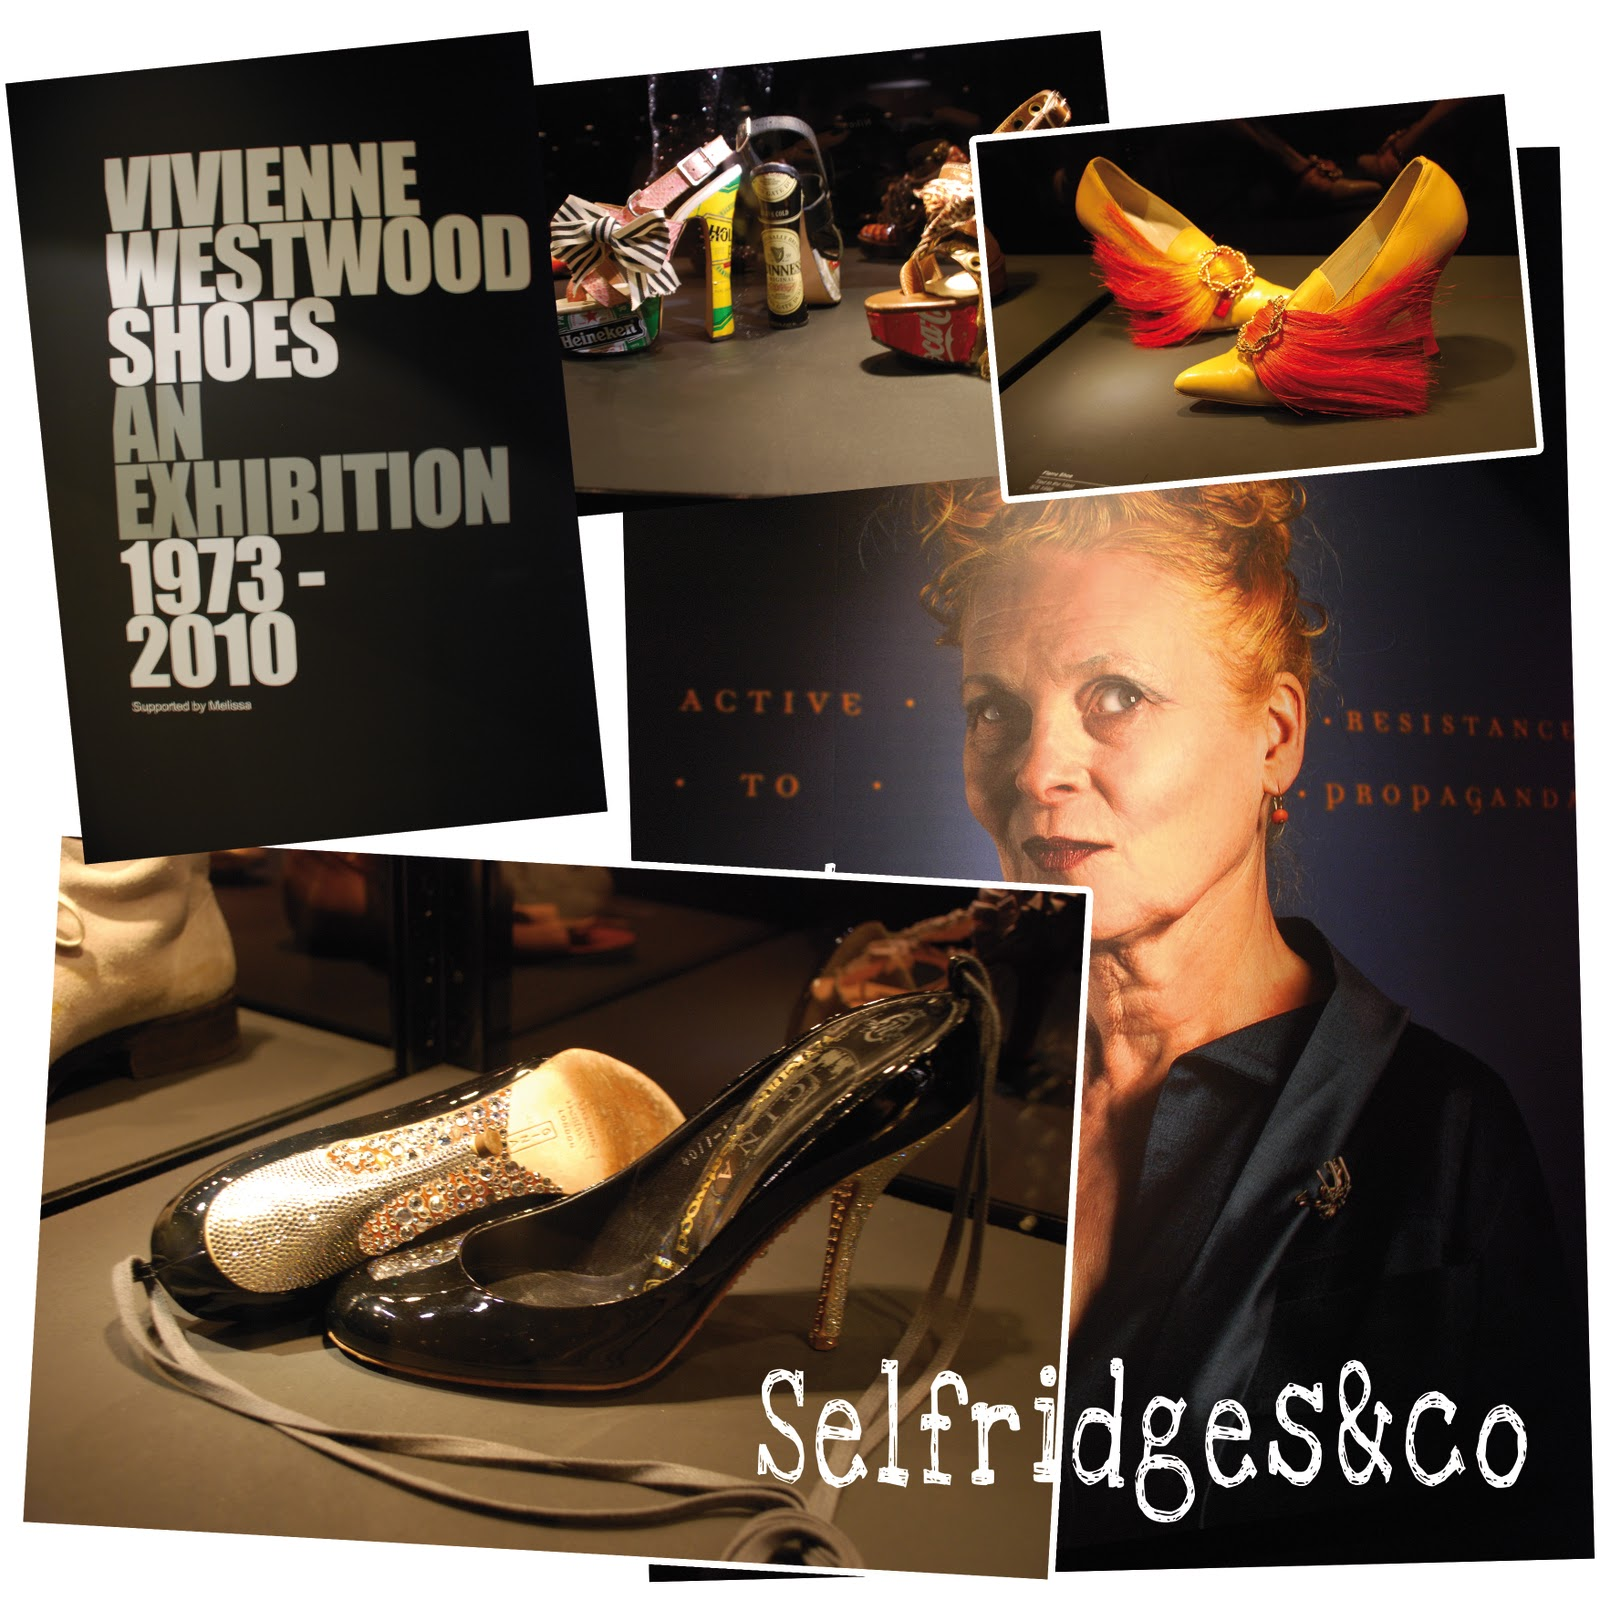 Vivienne Westwood Shoes An Exhibition 1973-2010 - Paperblog